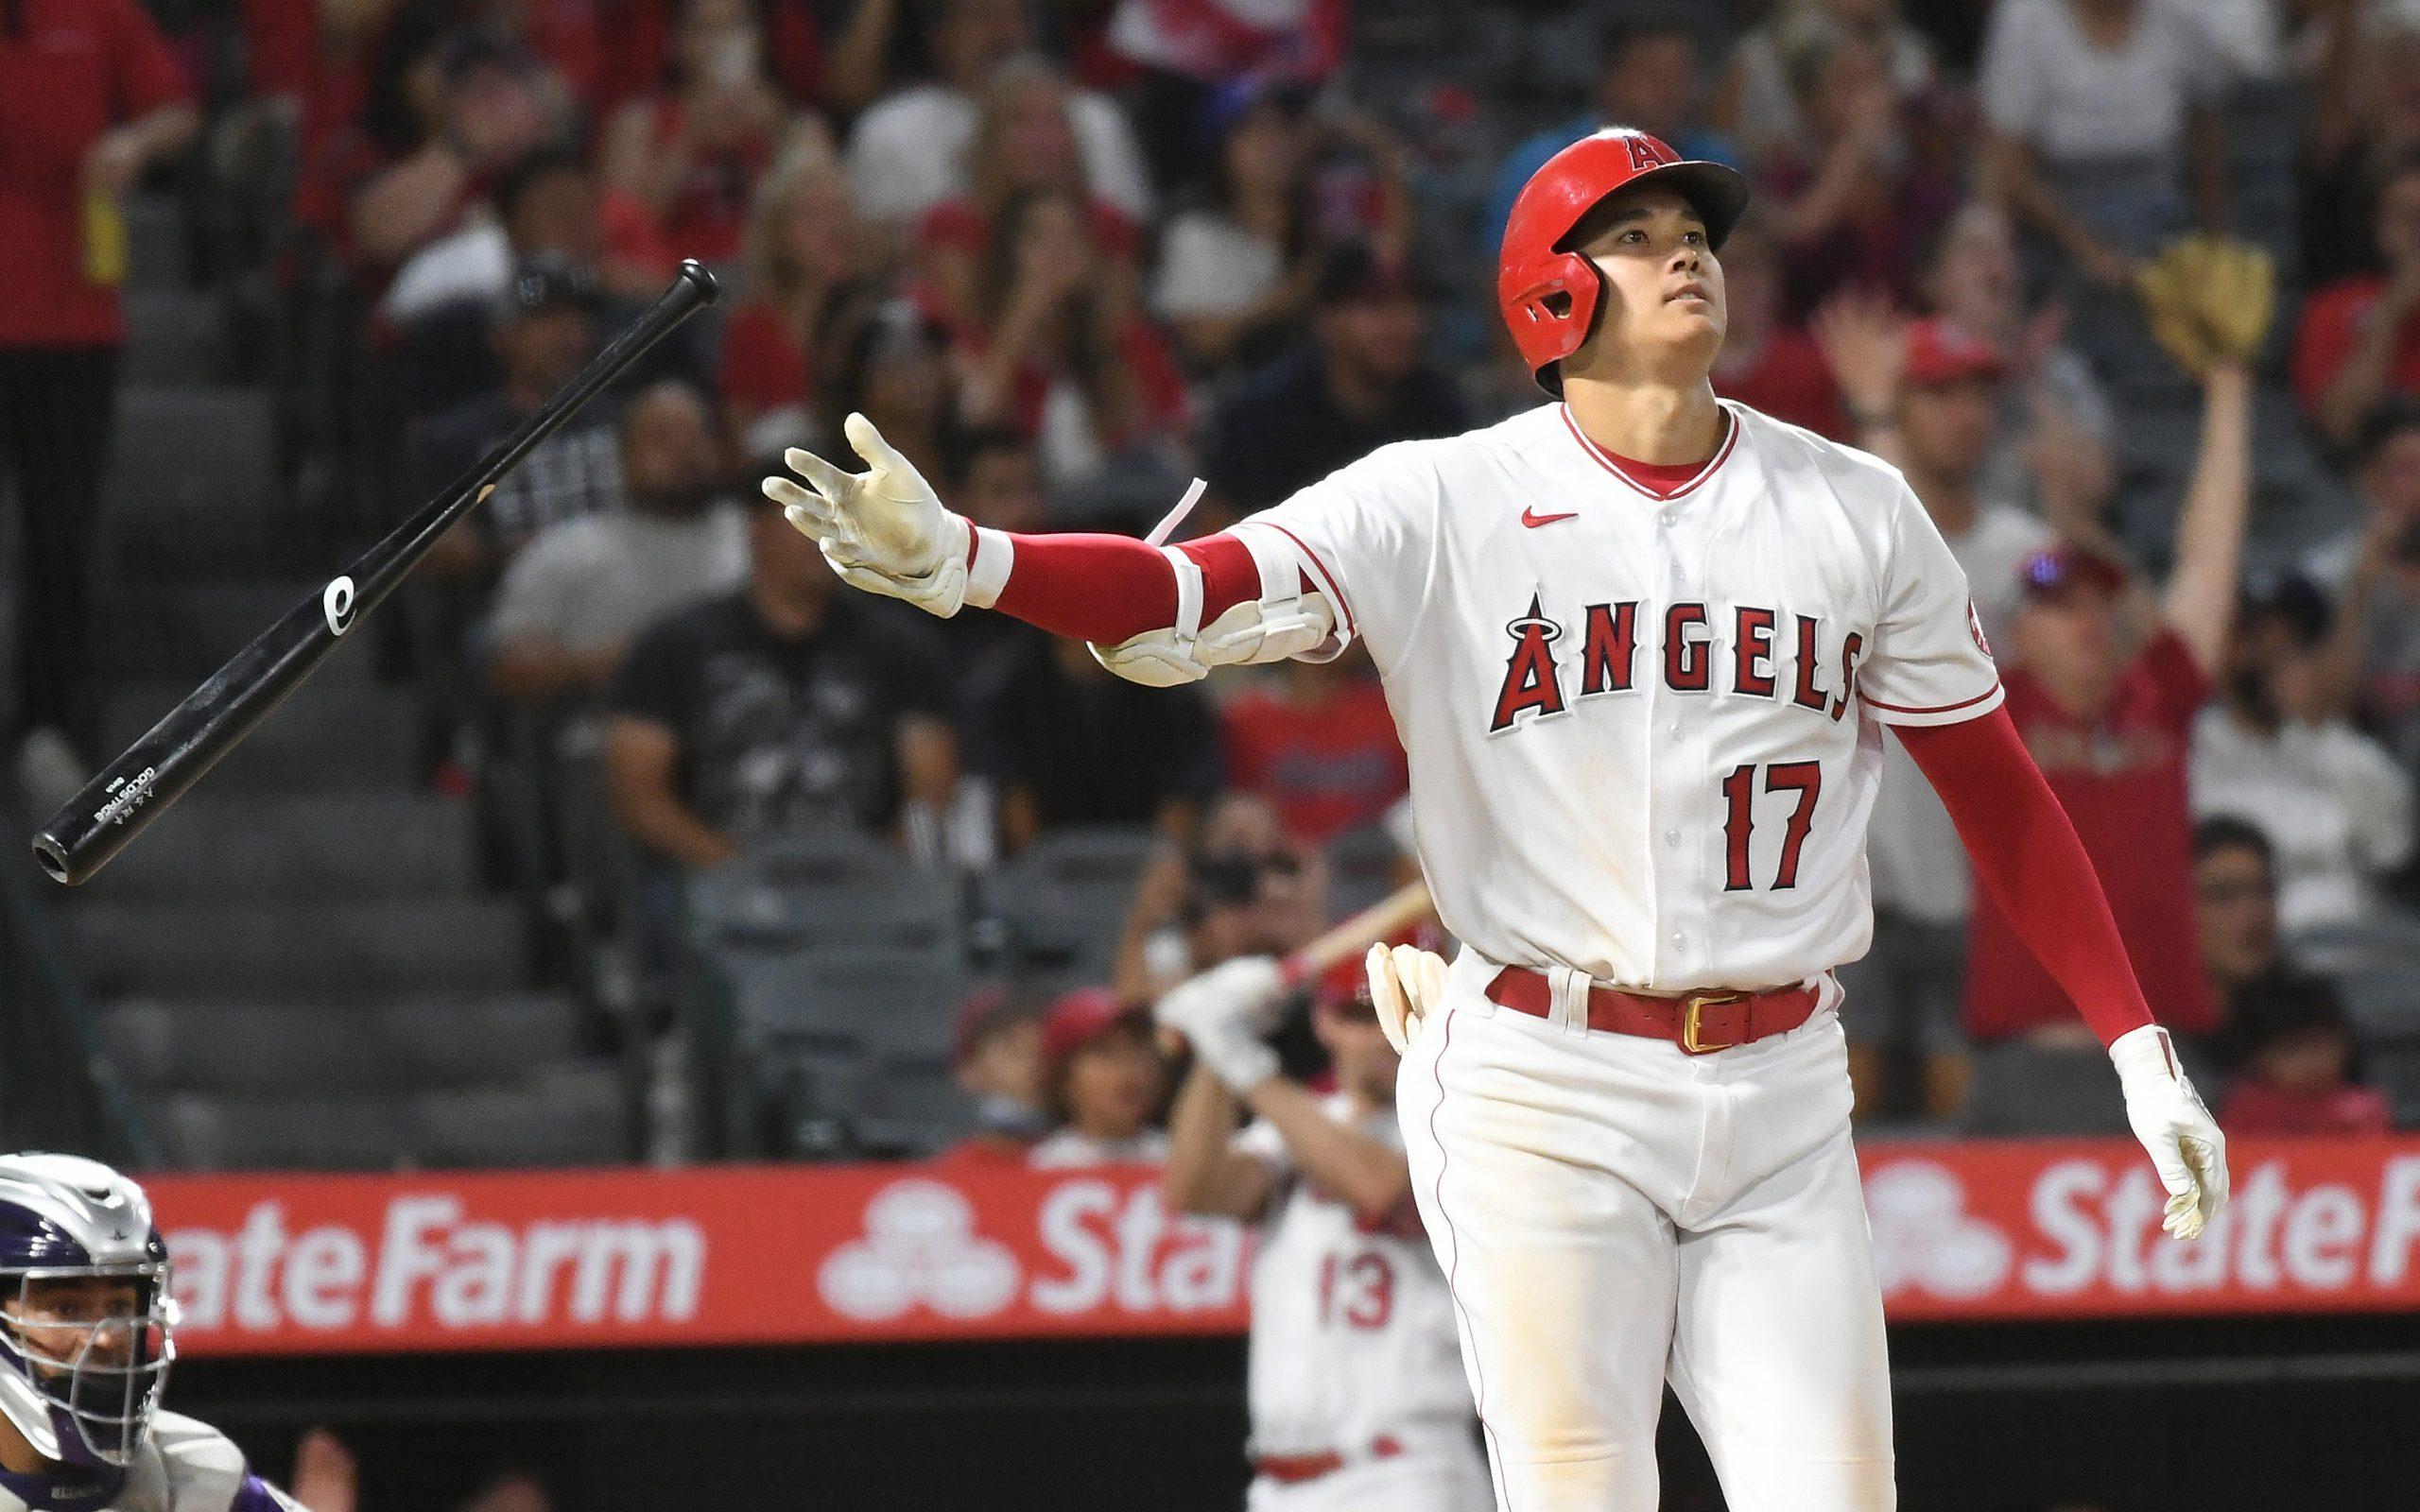 Shohei Ohtani crushes home run No. 37, extending MLB lead